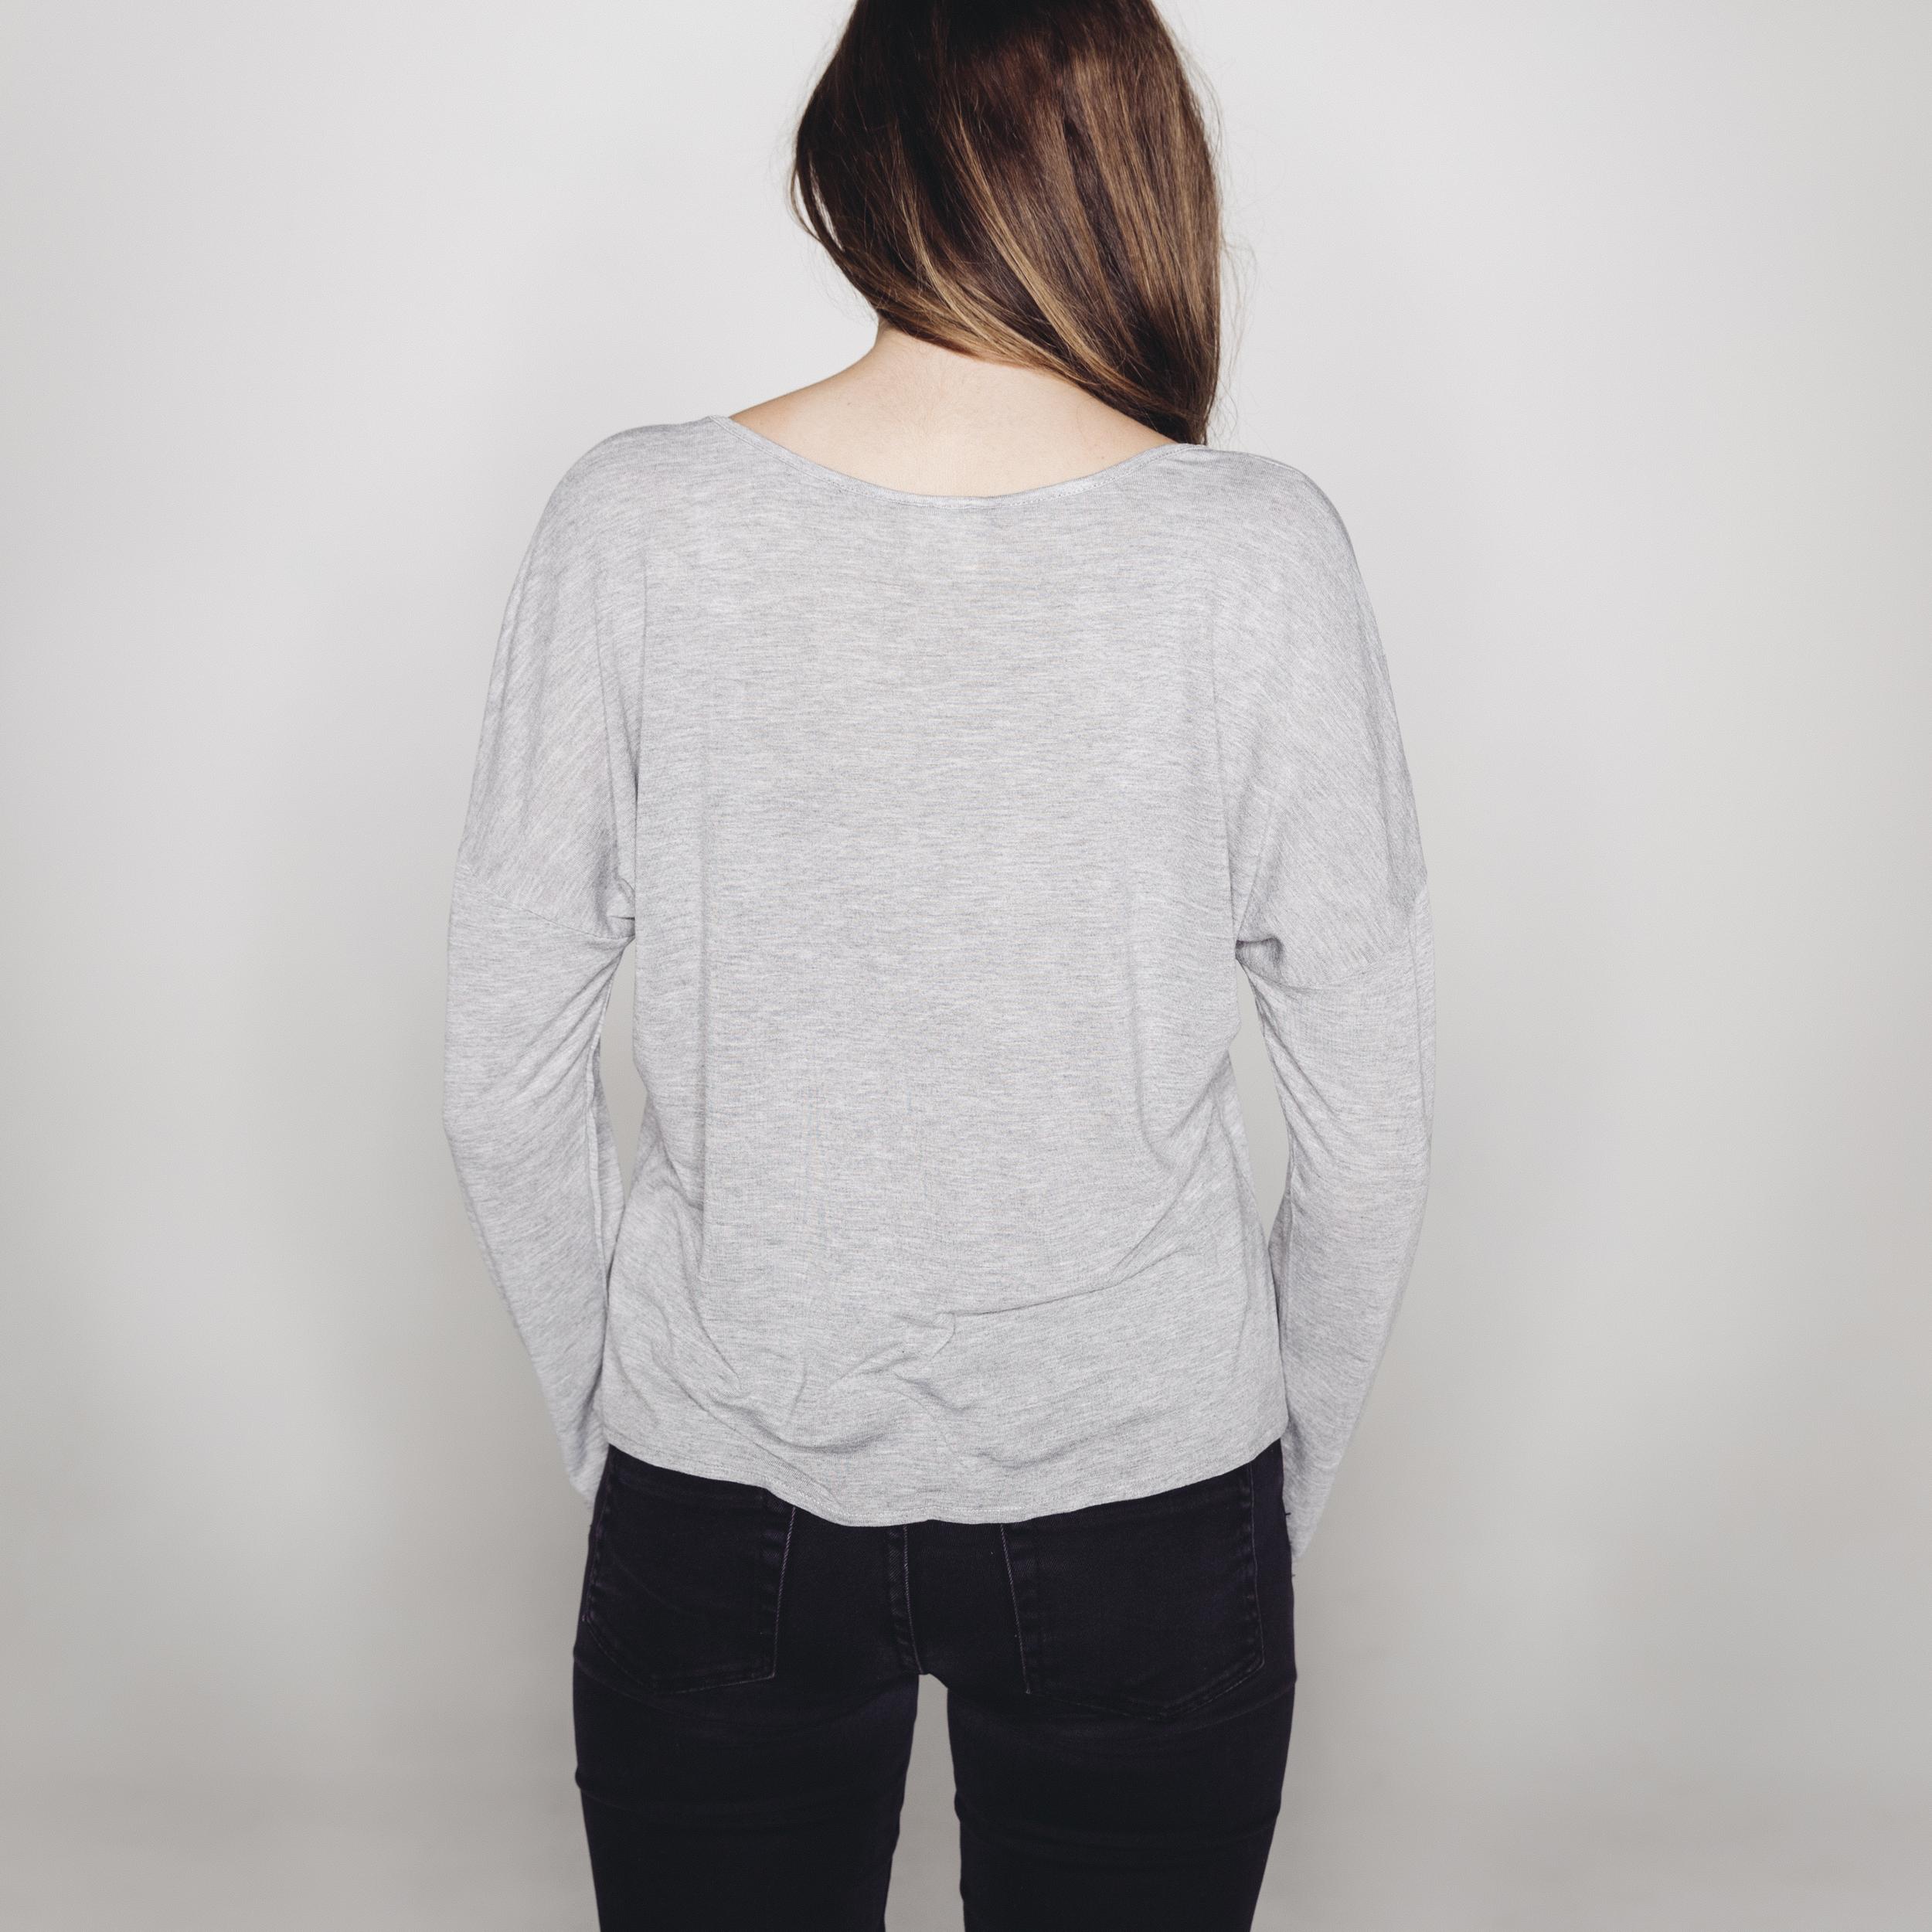 Dorsu Slip On Long Sleeve - Grey   AUD $39